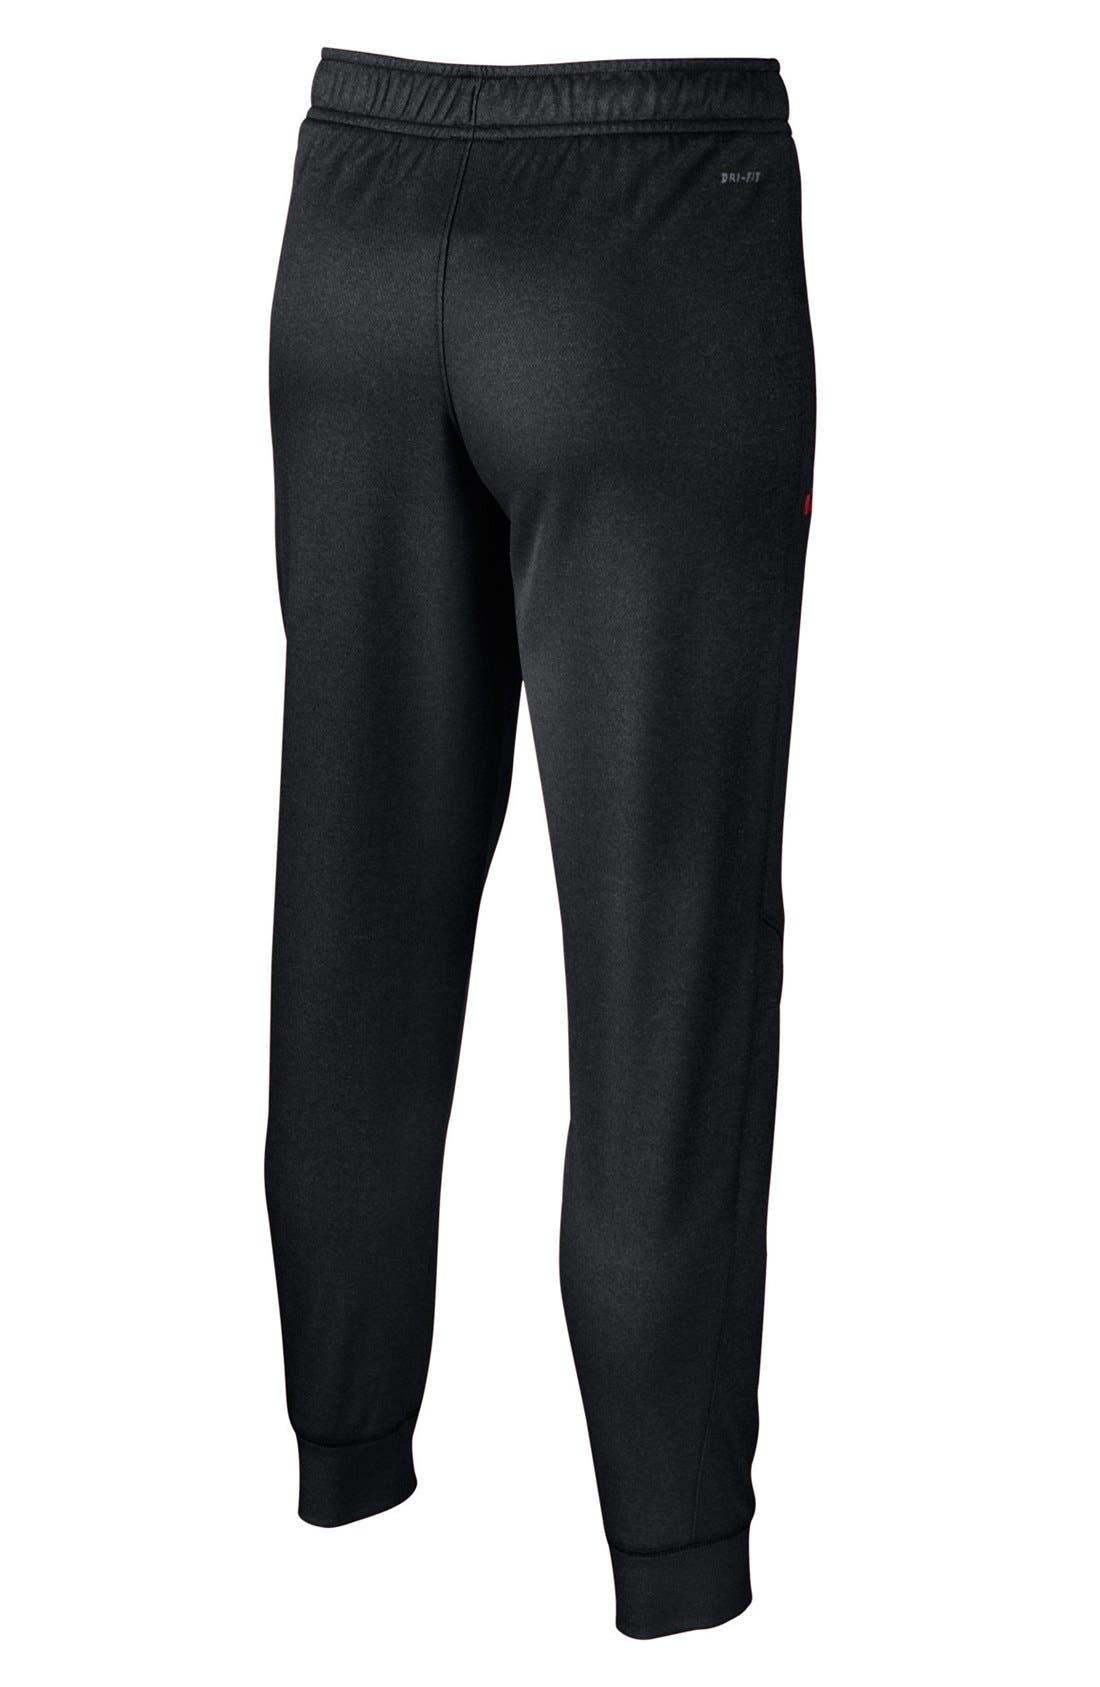 Alternate Image 2  - Nike 'LeBron Performance Hero' Dri-FIT Pants (Big Boys)